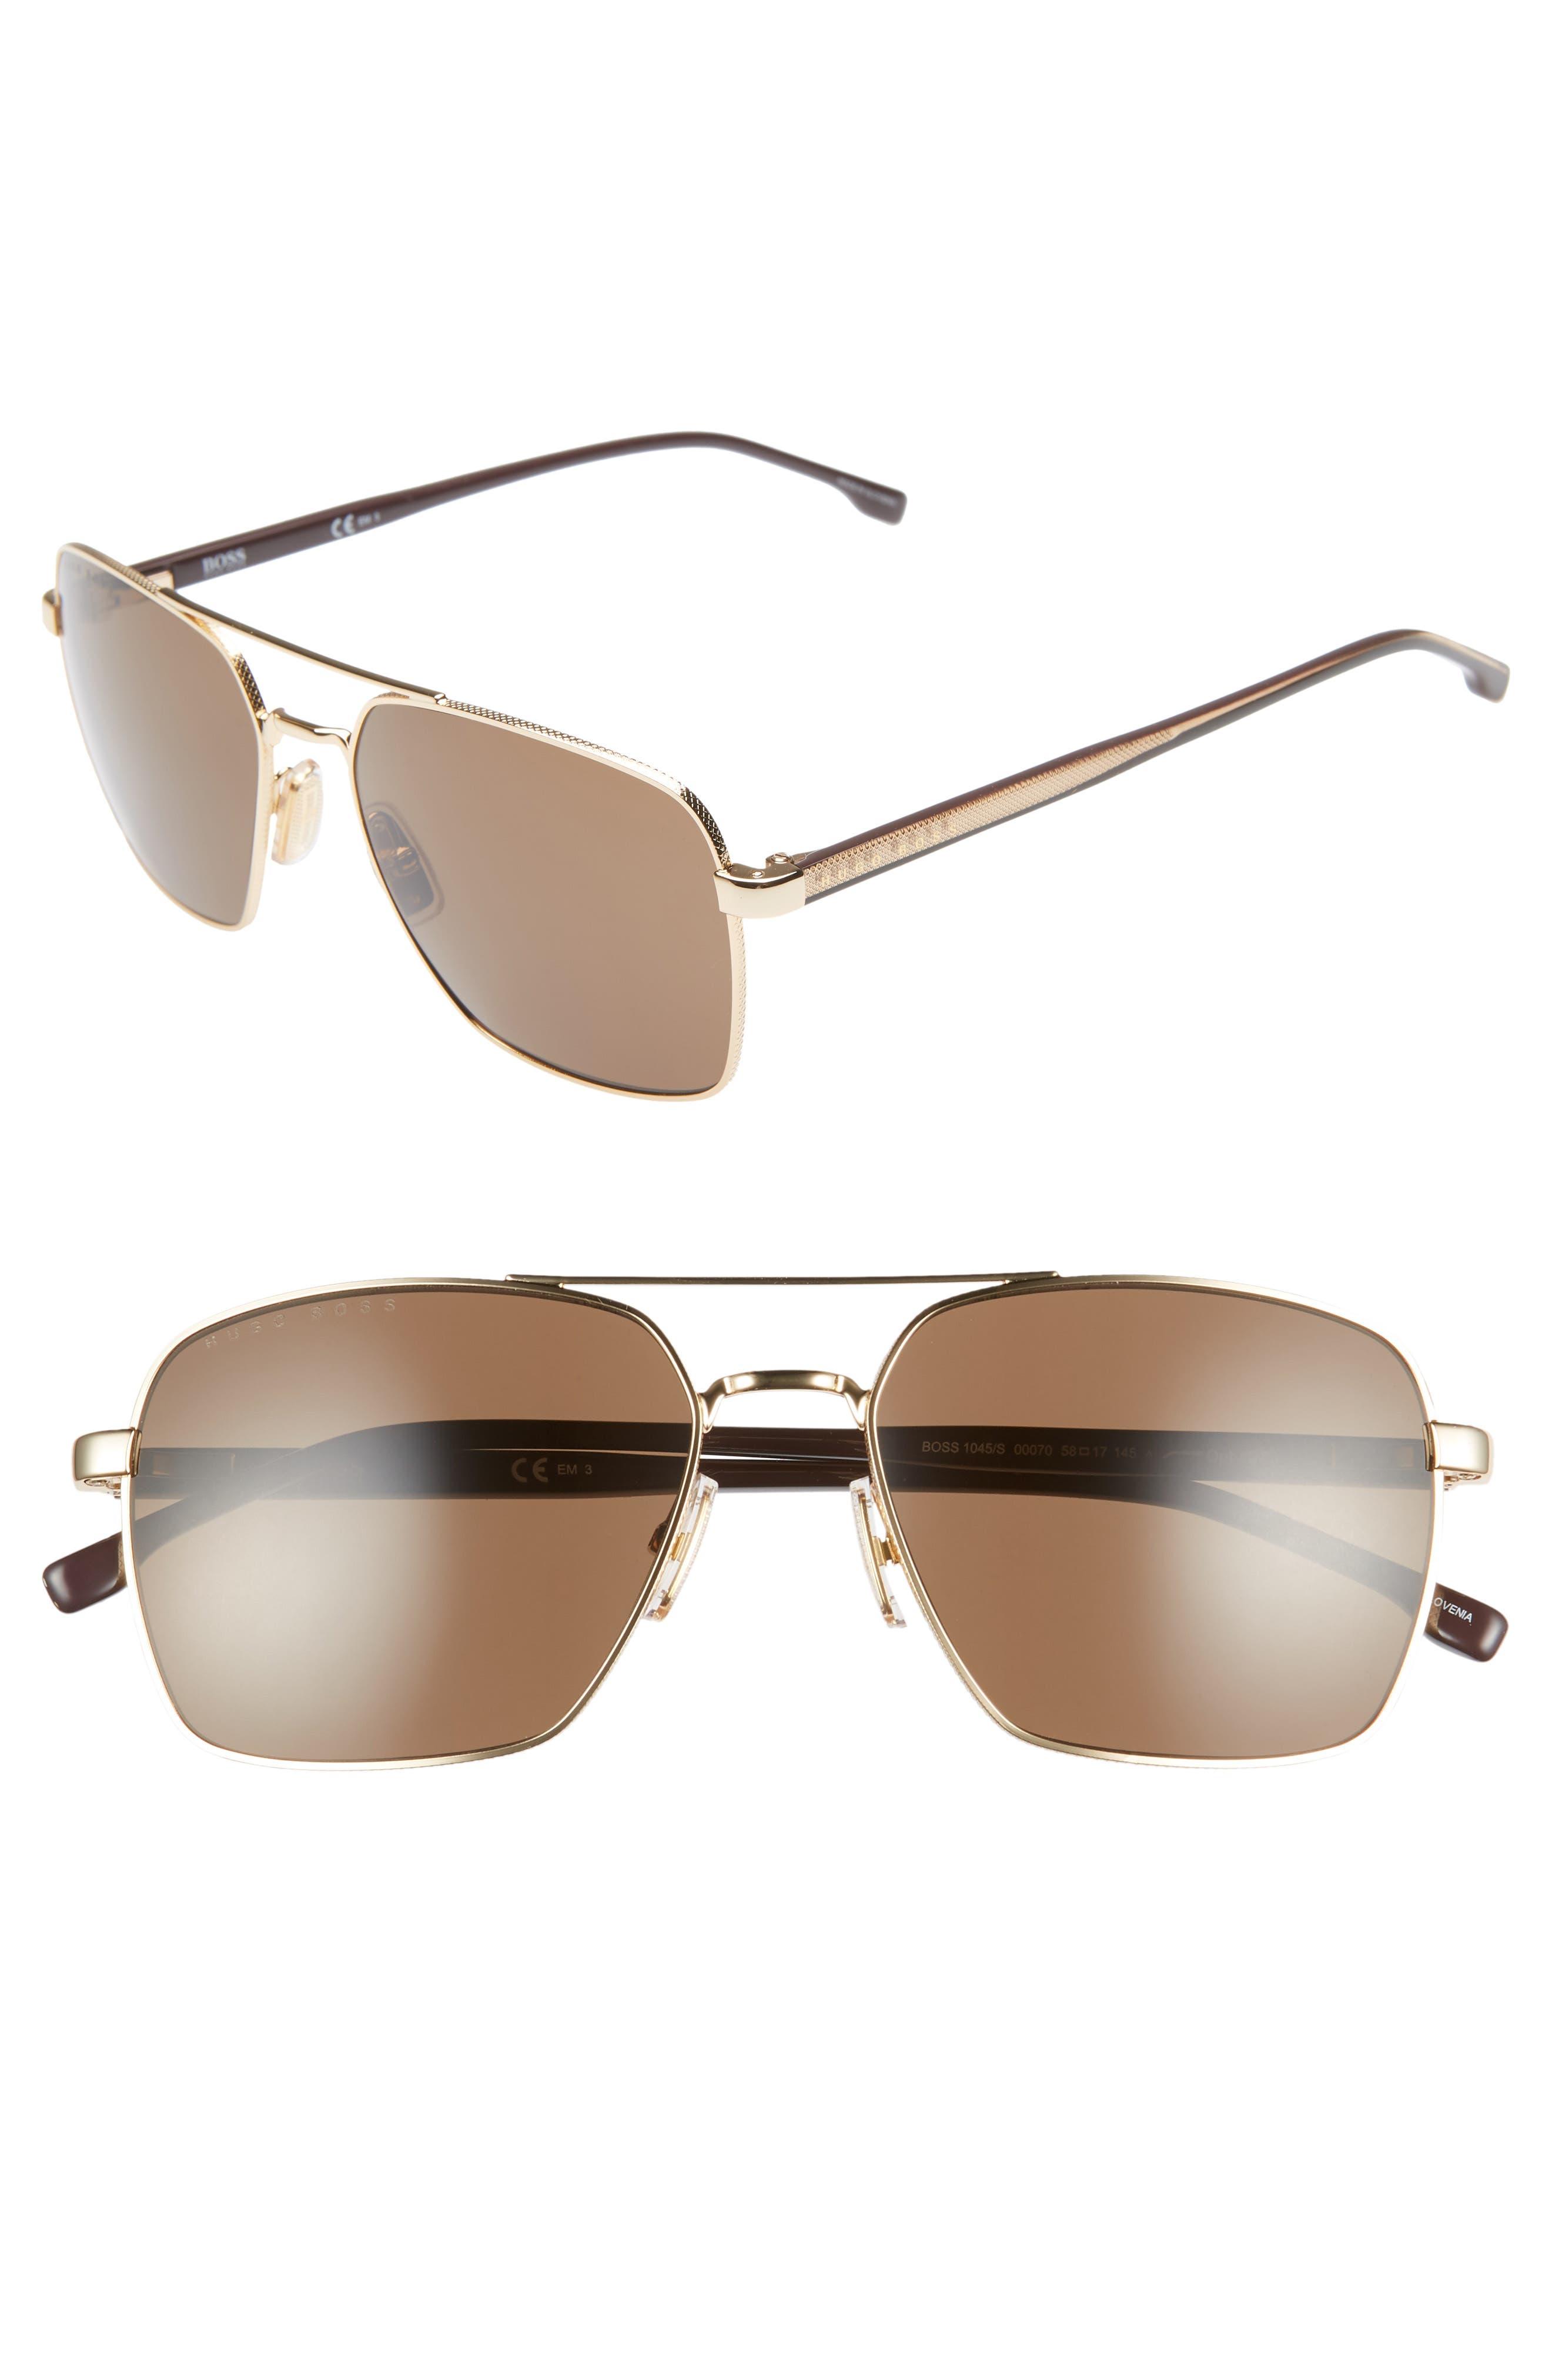 bddb0759d5a4 Boss 5m Navigator Sunglasses - Rose Gold